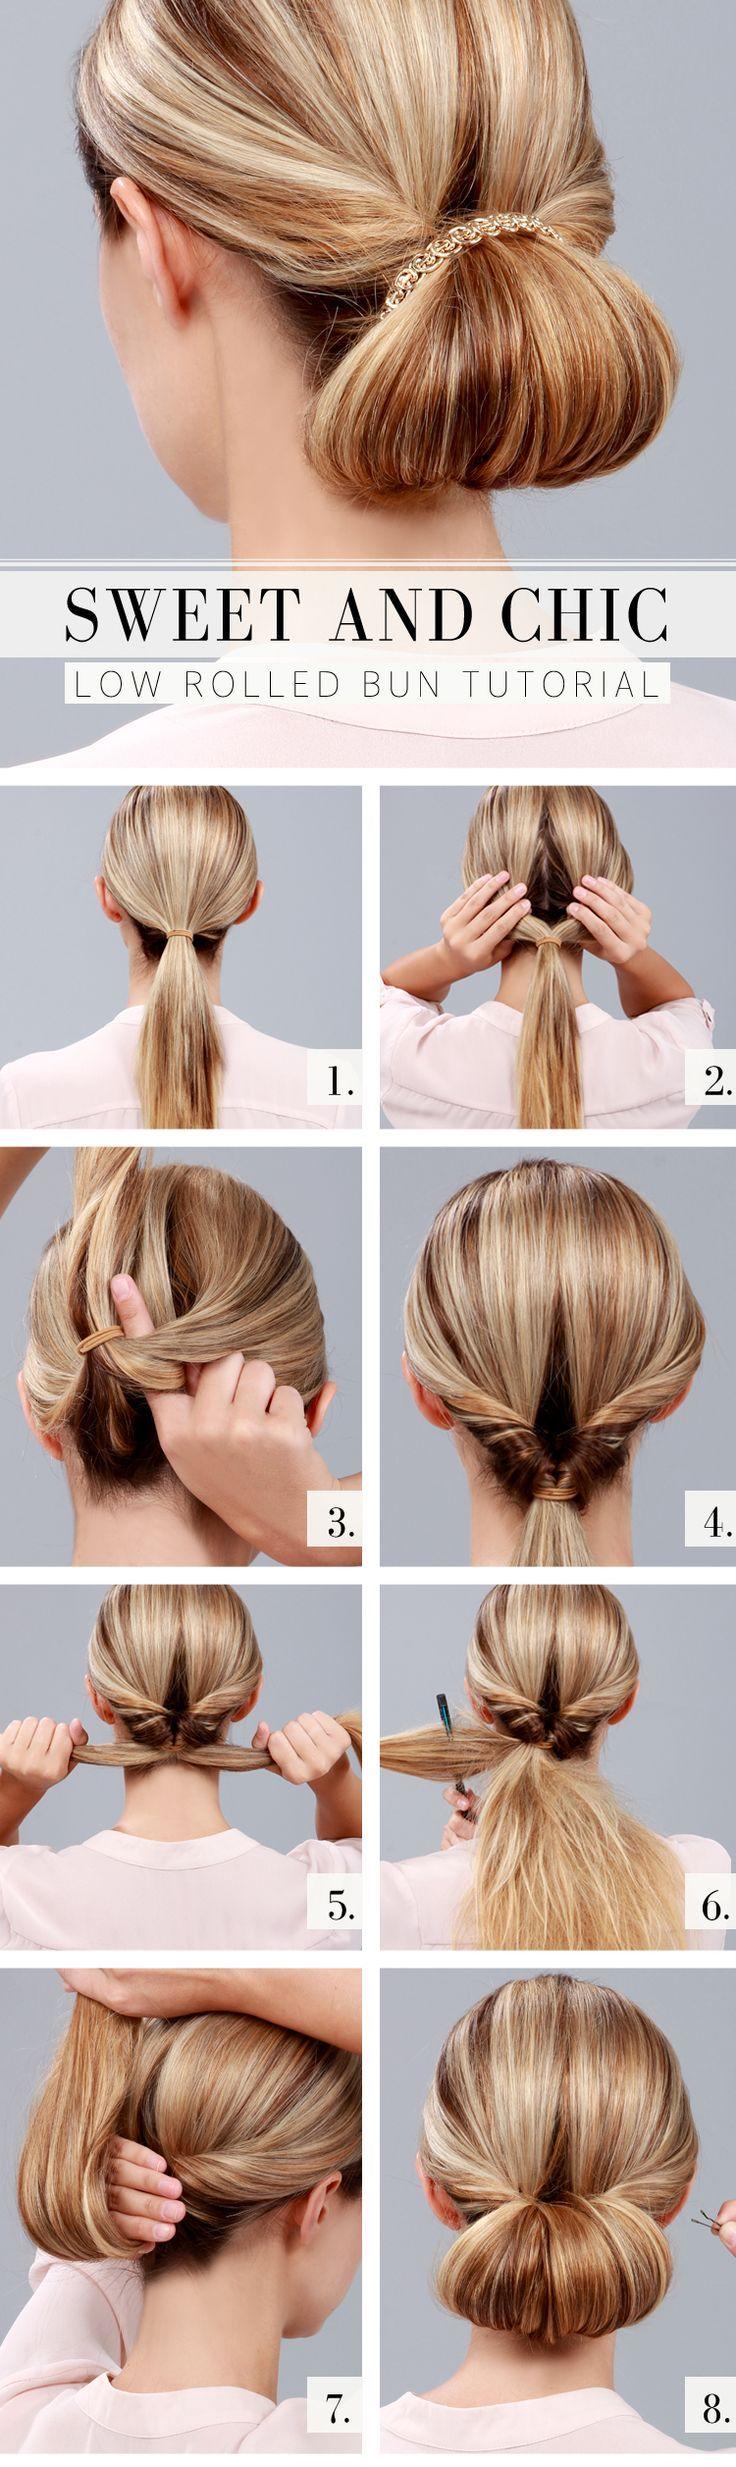 Chic Low Rolled Bun #Hair #Anleitung